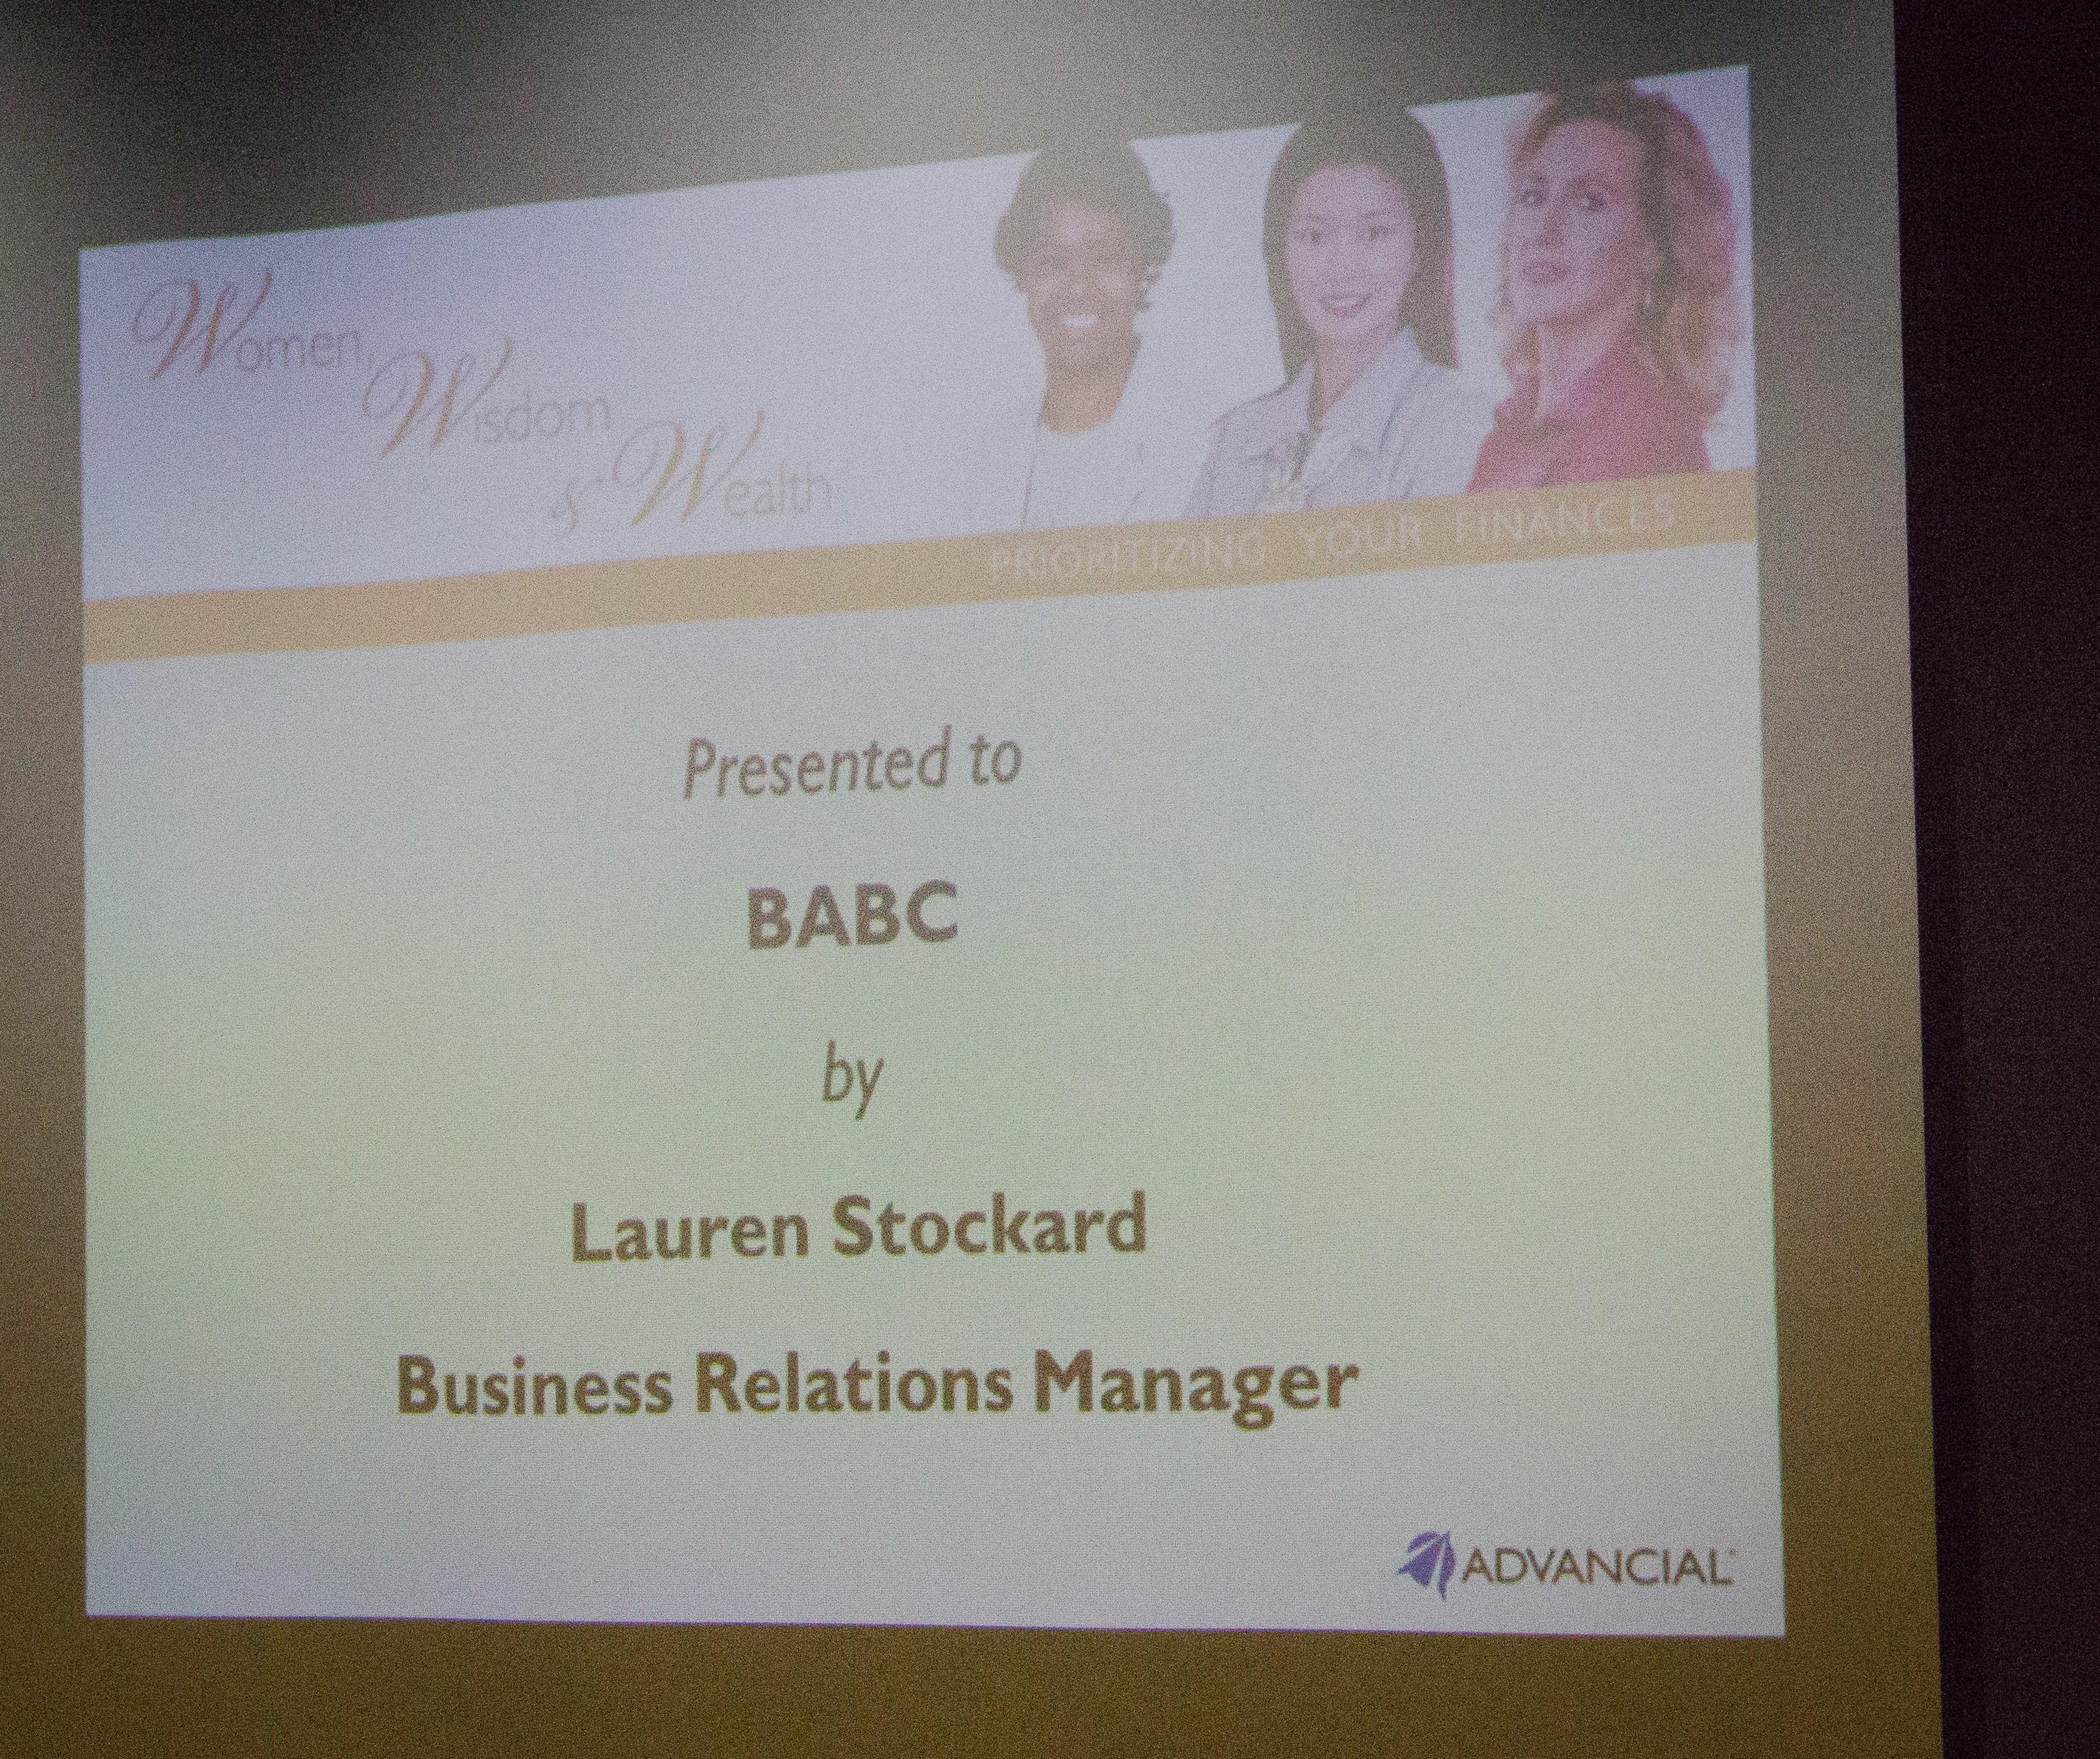 BABC Houston Women Financial Seminar with Lauren Stockard April 2012